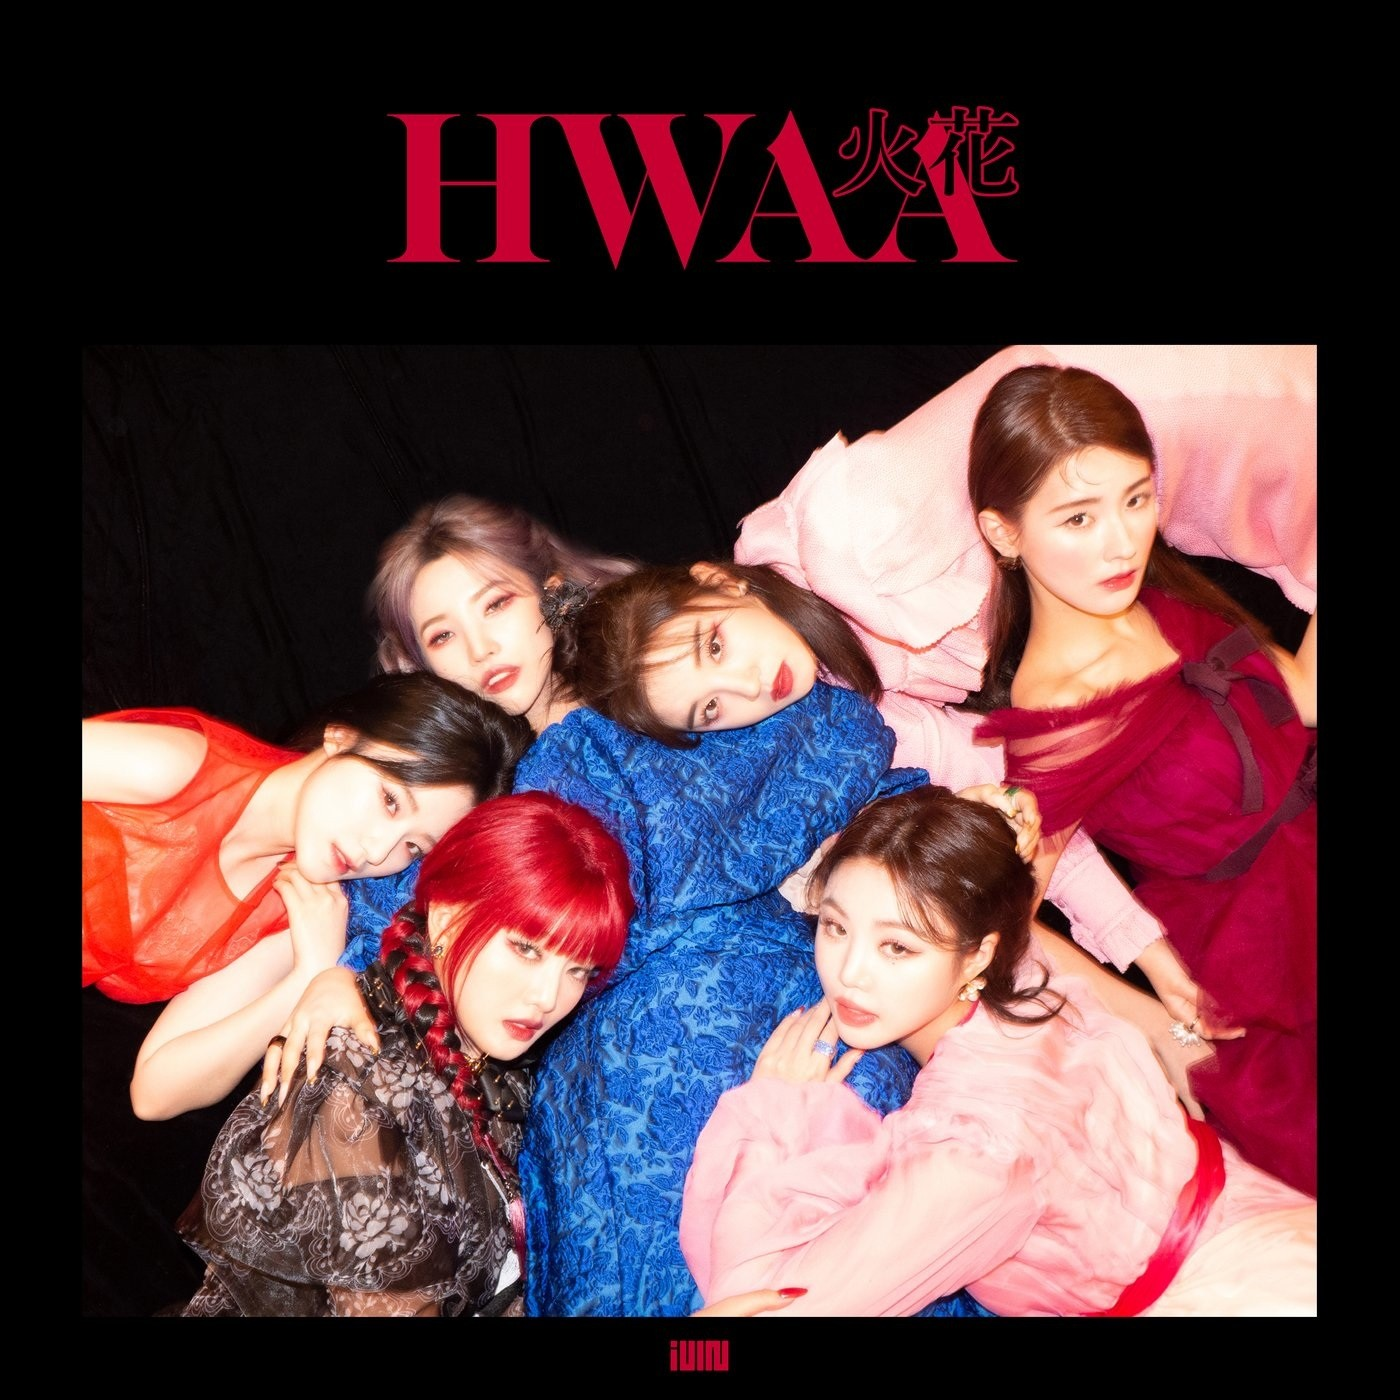 (G)I-DLE – HWAA [FLAC + MP3 320 / WEB] [2021.01.27]